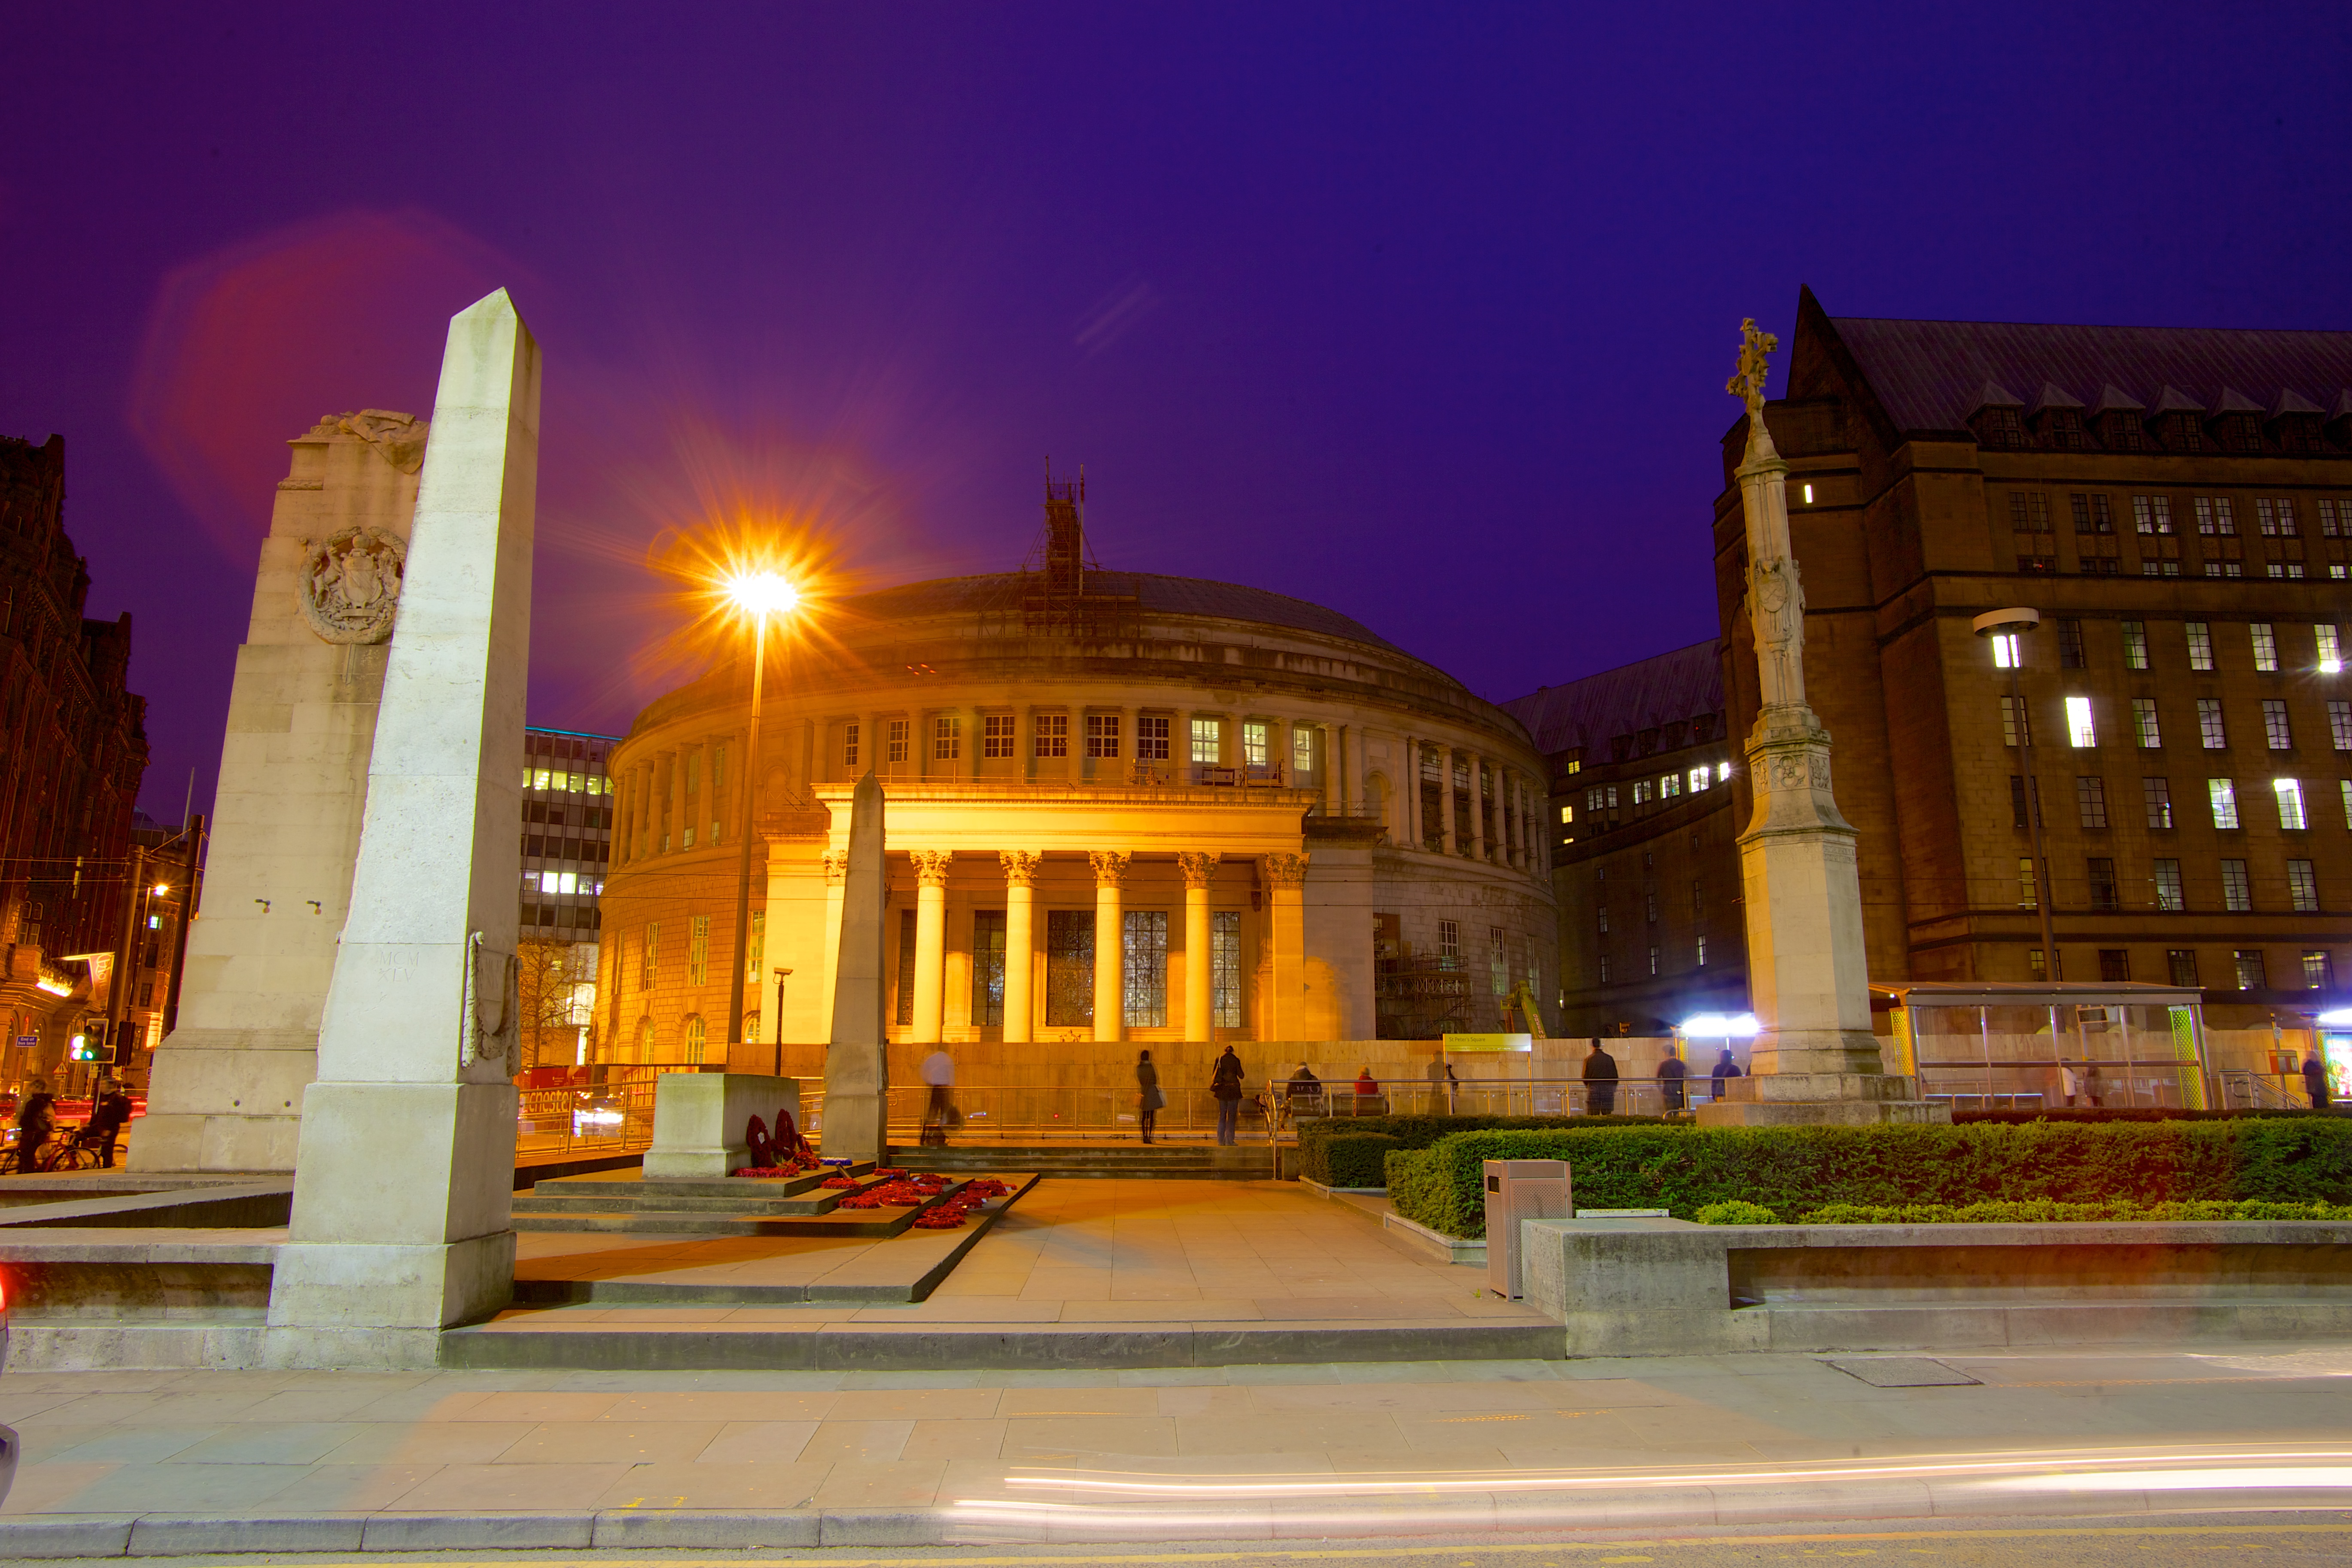 Imagebox_-_Manchester_St_Peters_Square-7.jpg?1548997305